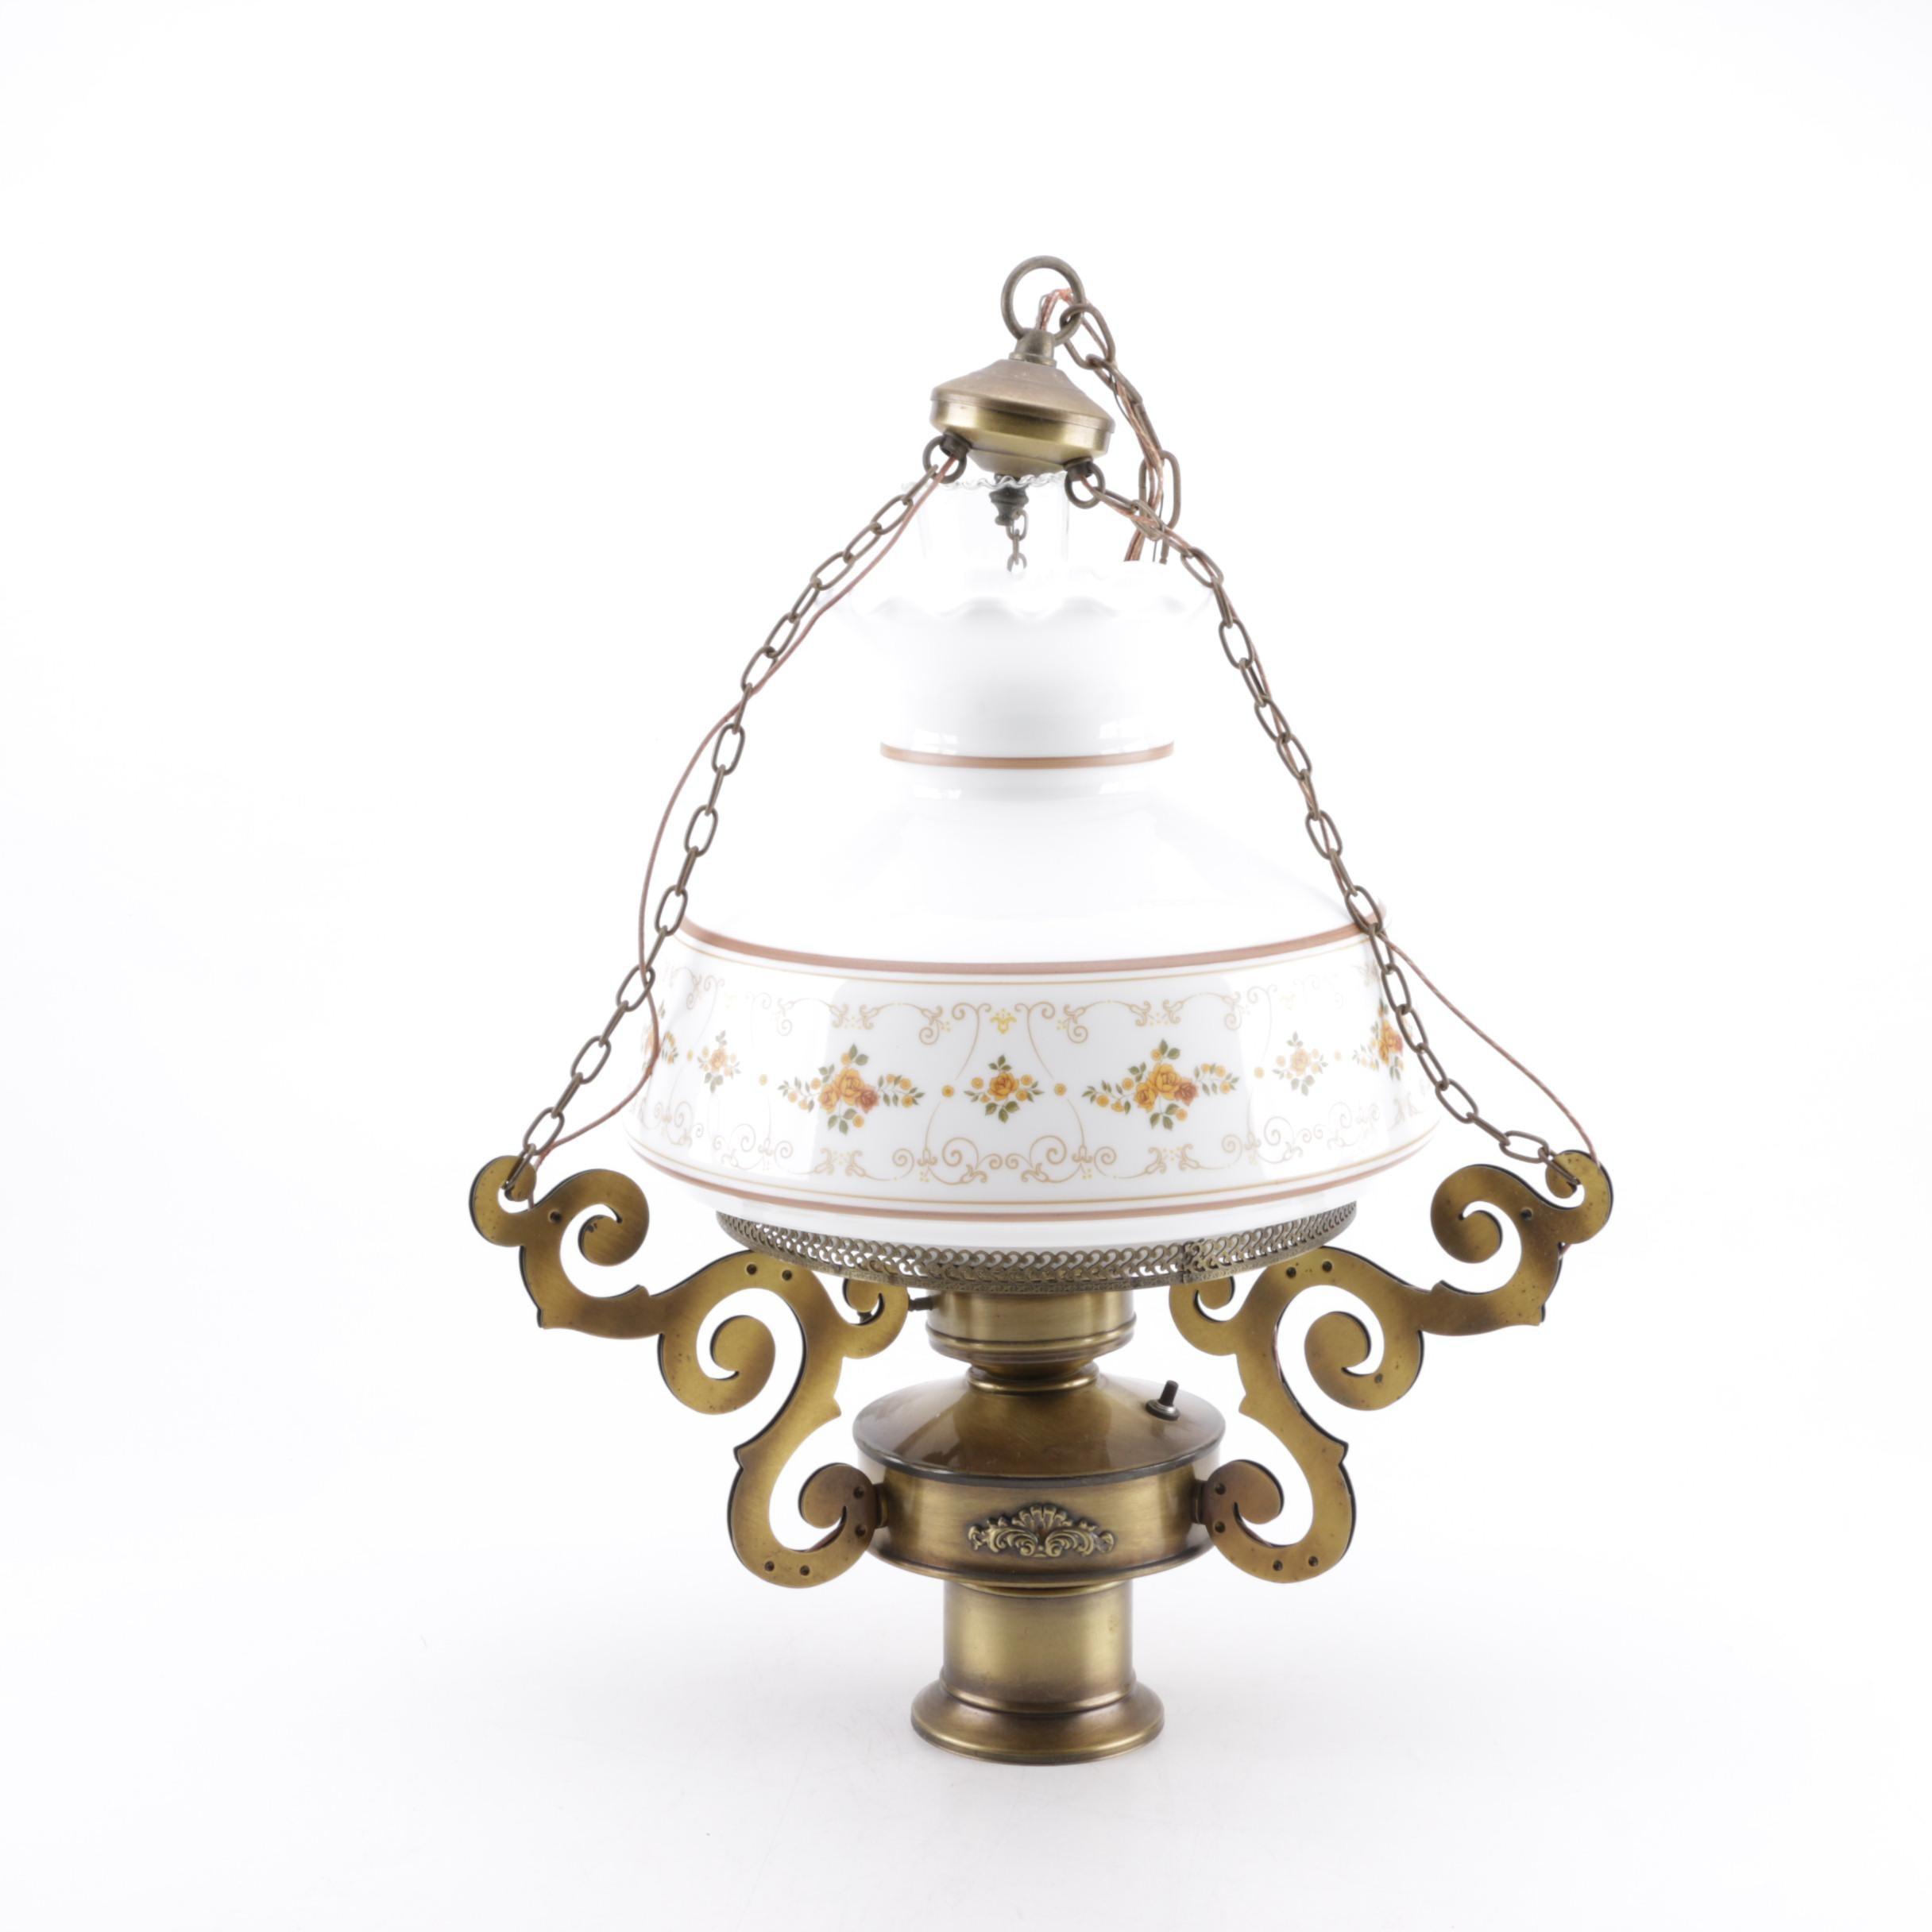 Electrified Kerosene Brass and Glass Pendant Light Fixture